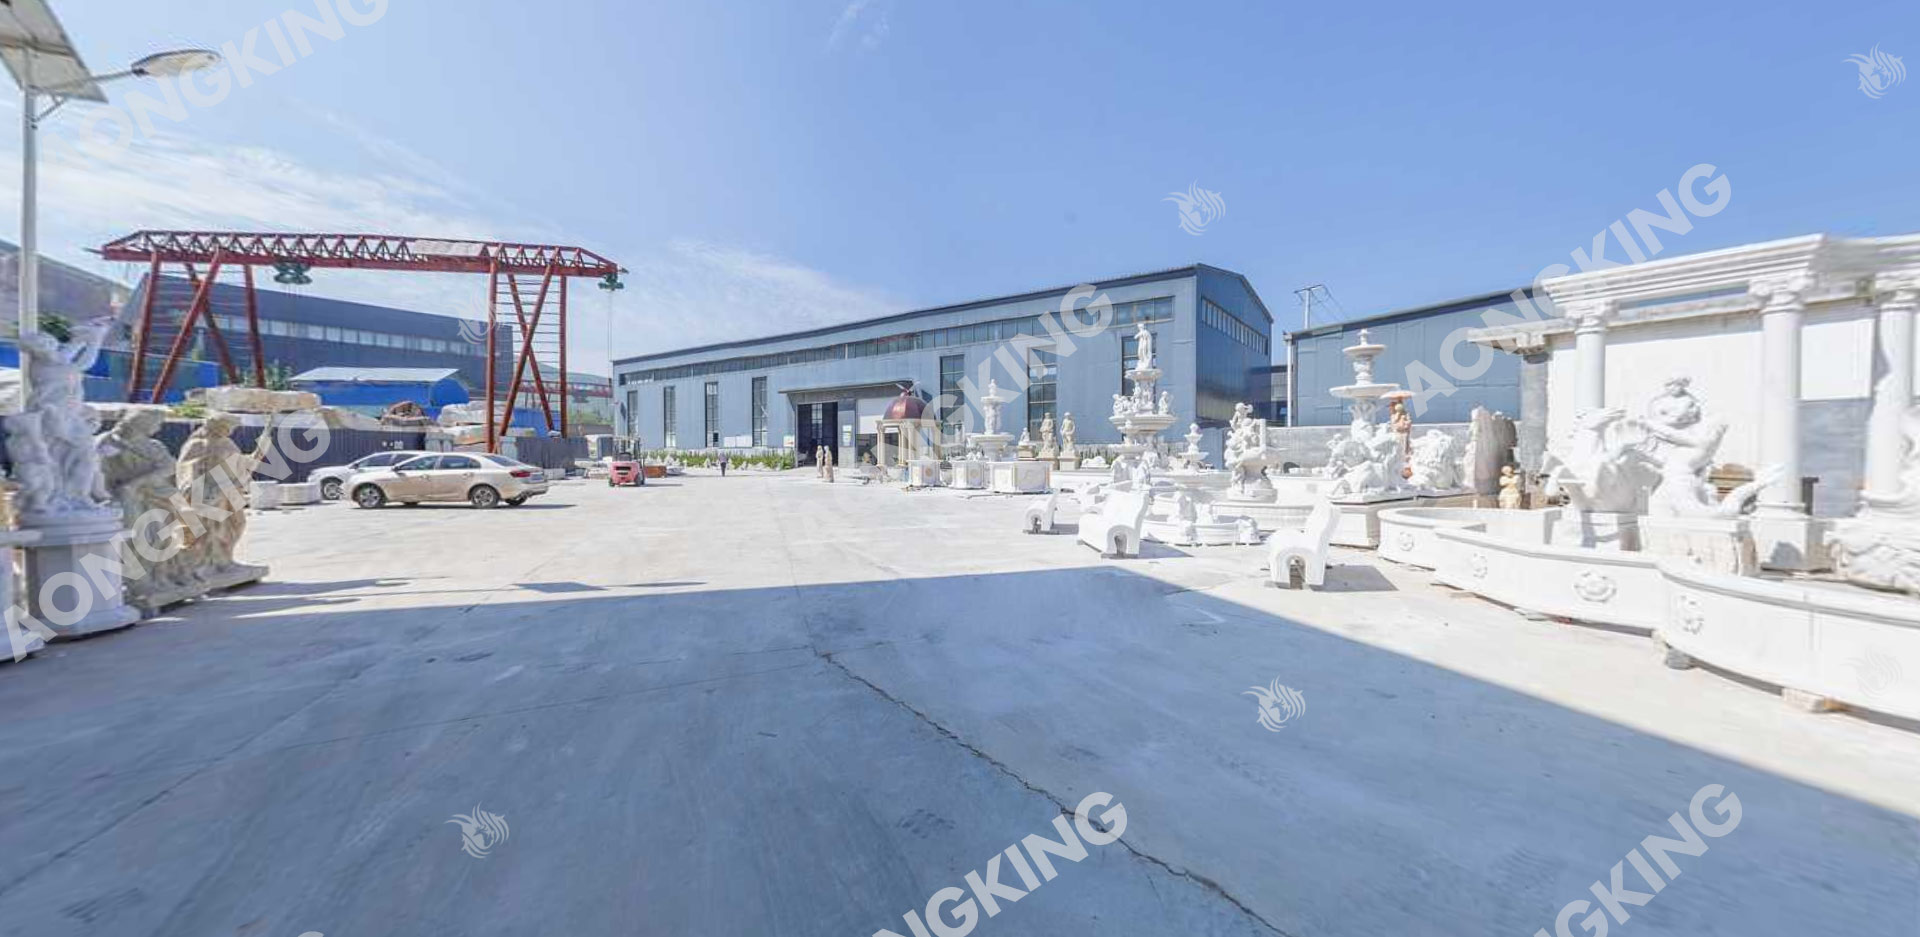 Aongking factory